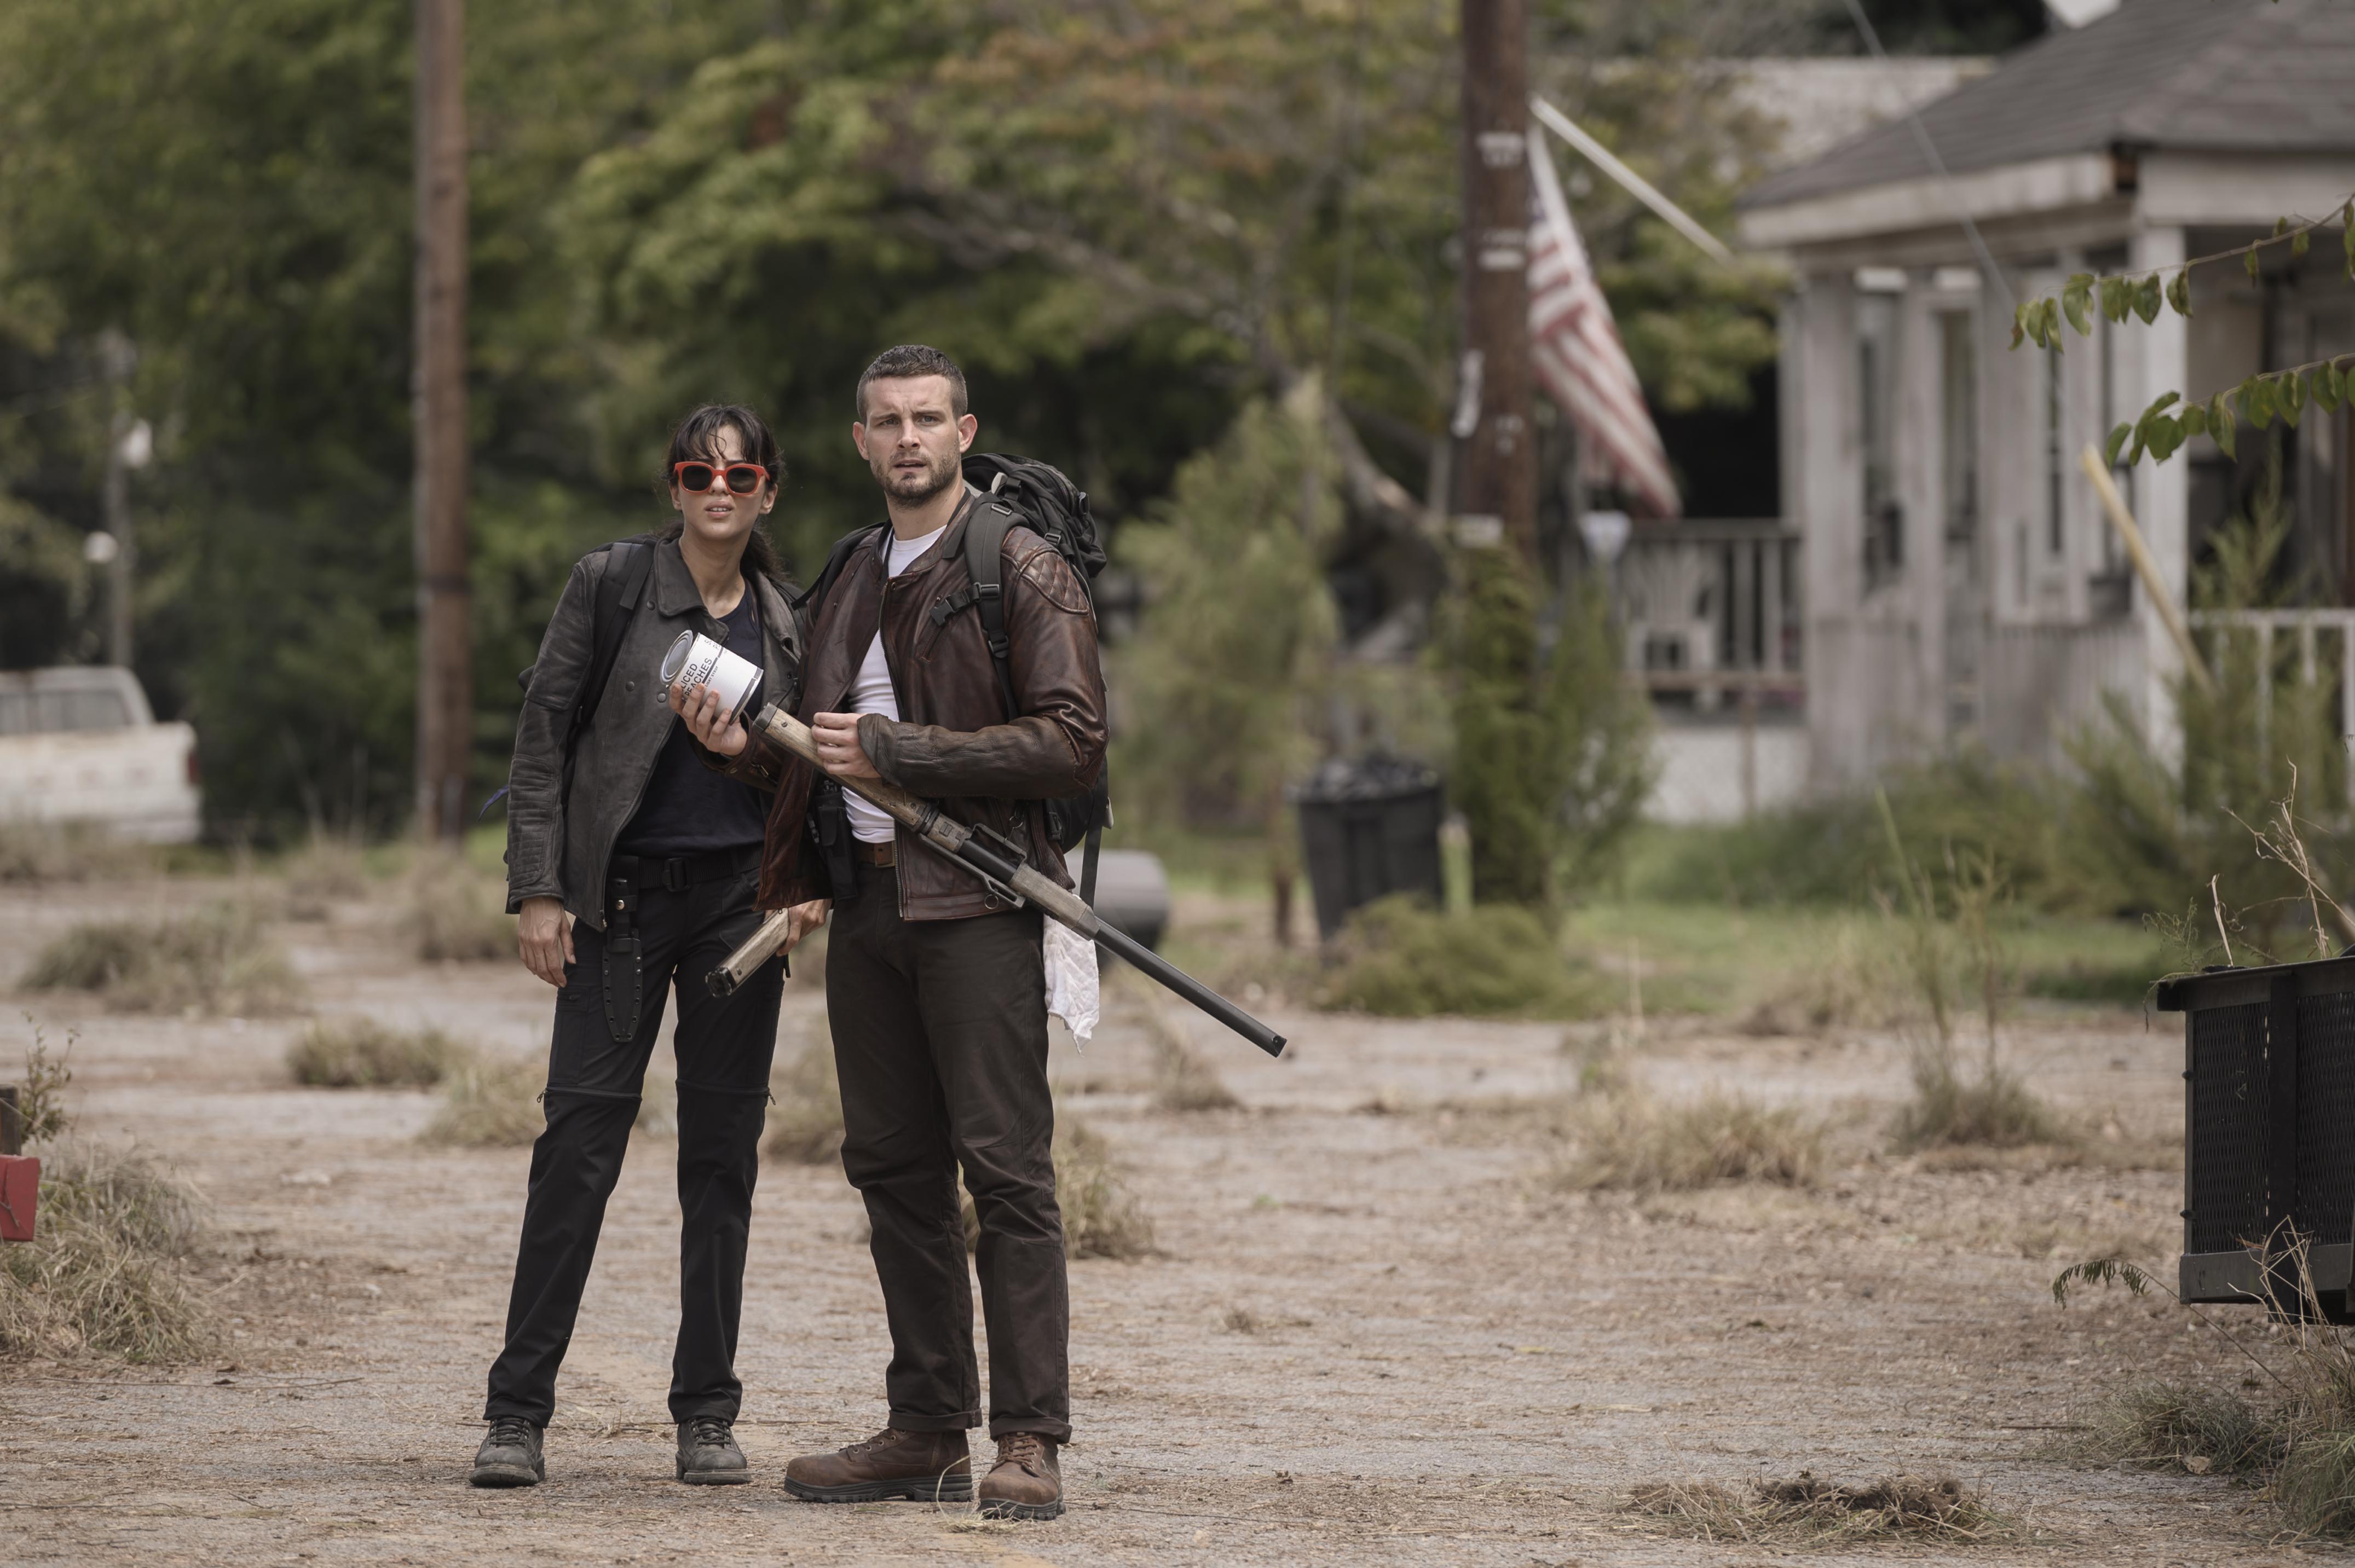 Nico Tortorella as Felix, Annet Mahendru as Huck - TWD3 _ Season 1 - Photo Credit: Jojo Whilden/AMC